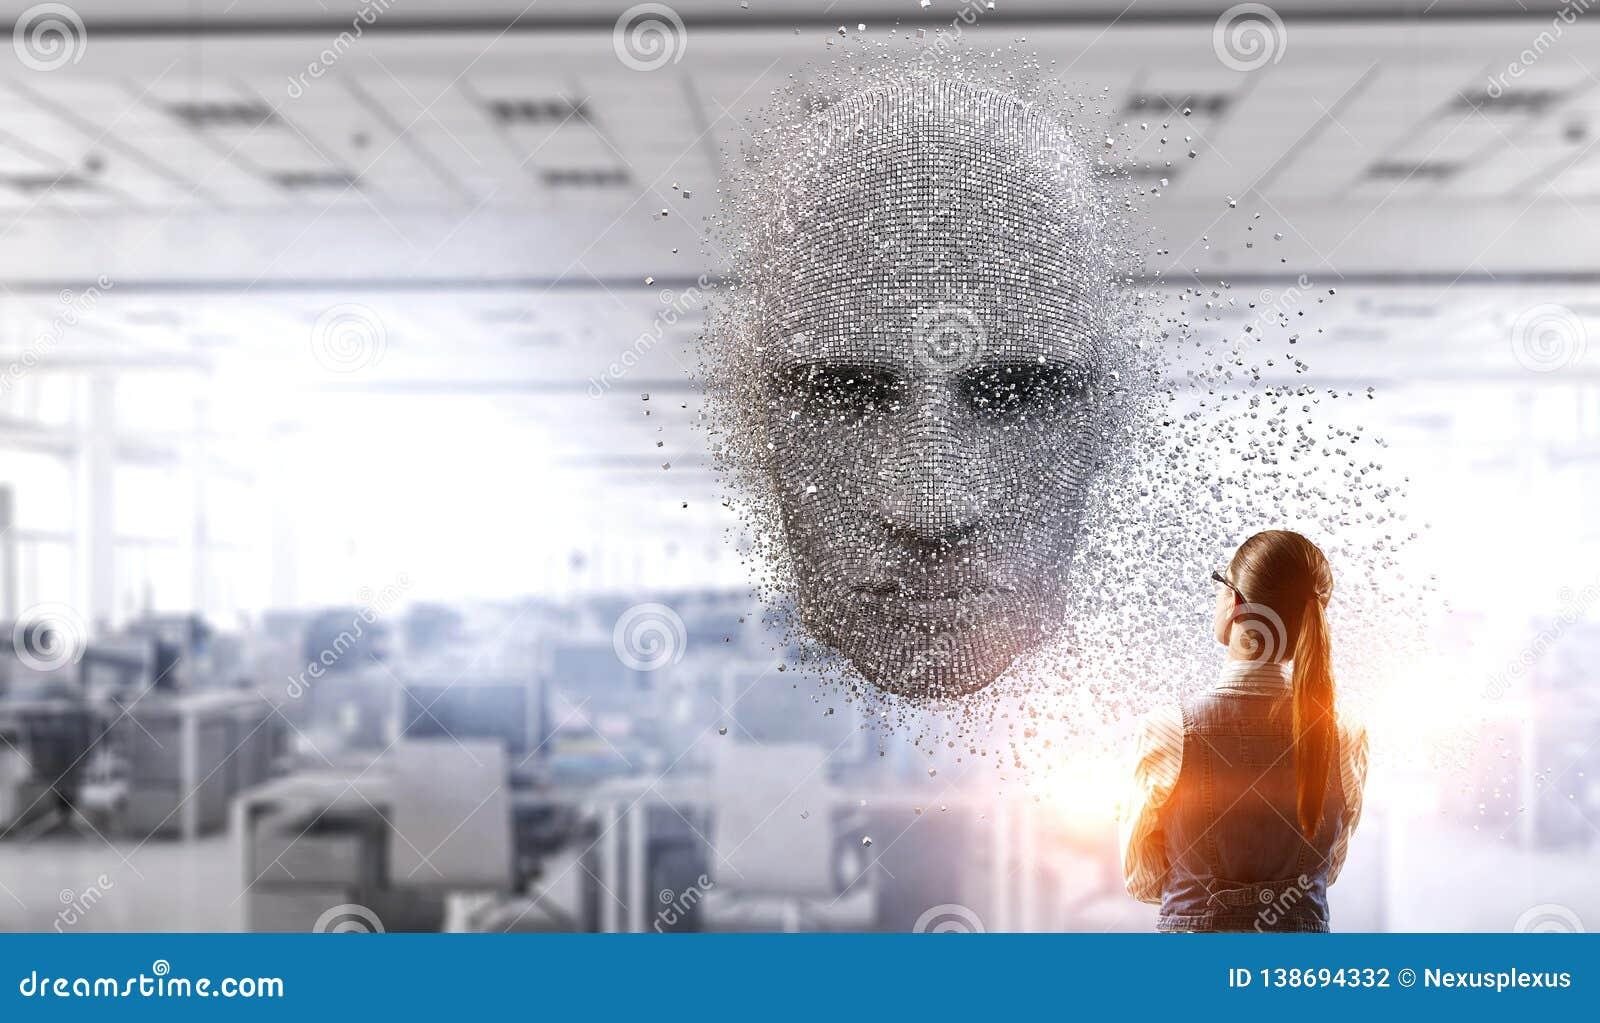 Inteligência artificial e tecnologias futuras Meios mistos